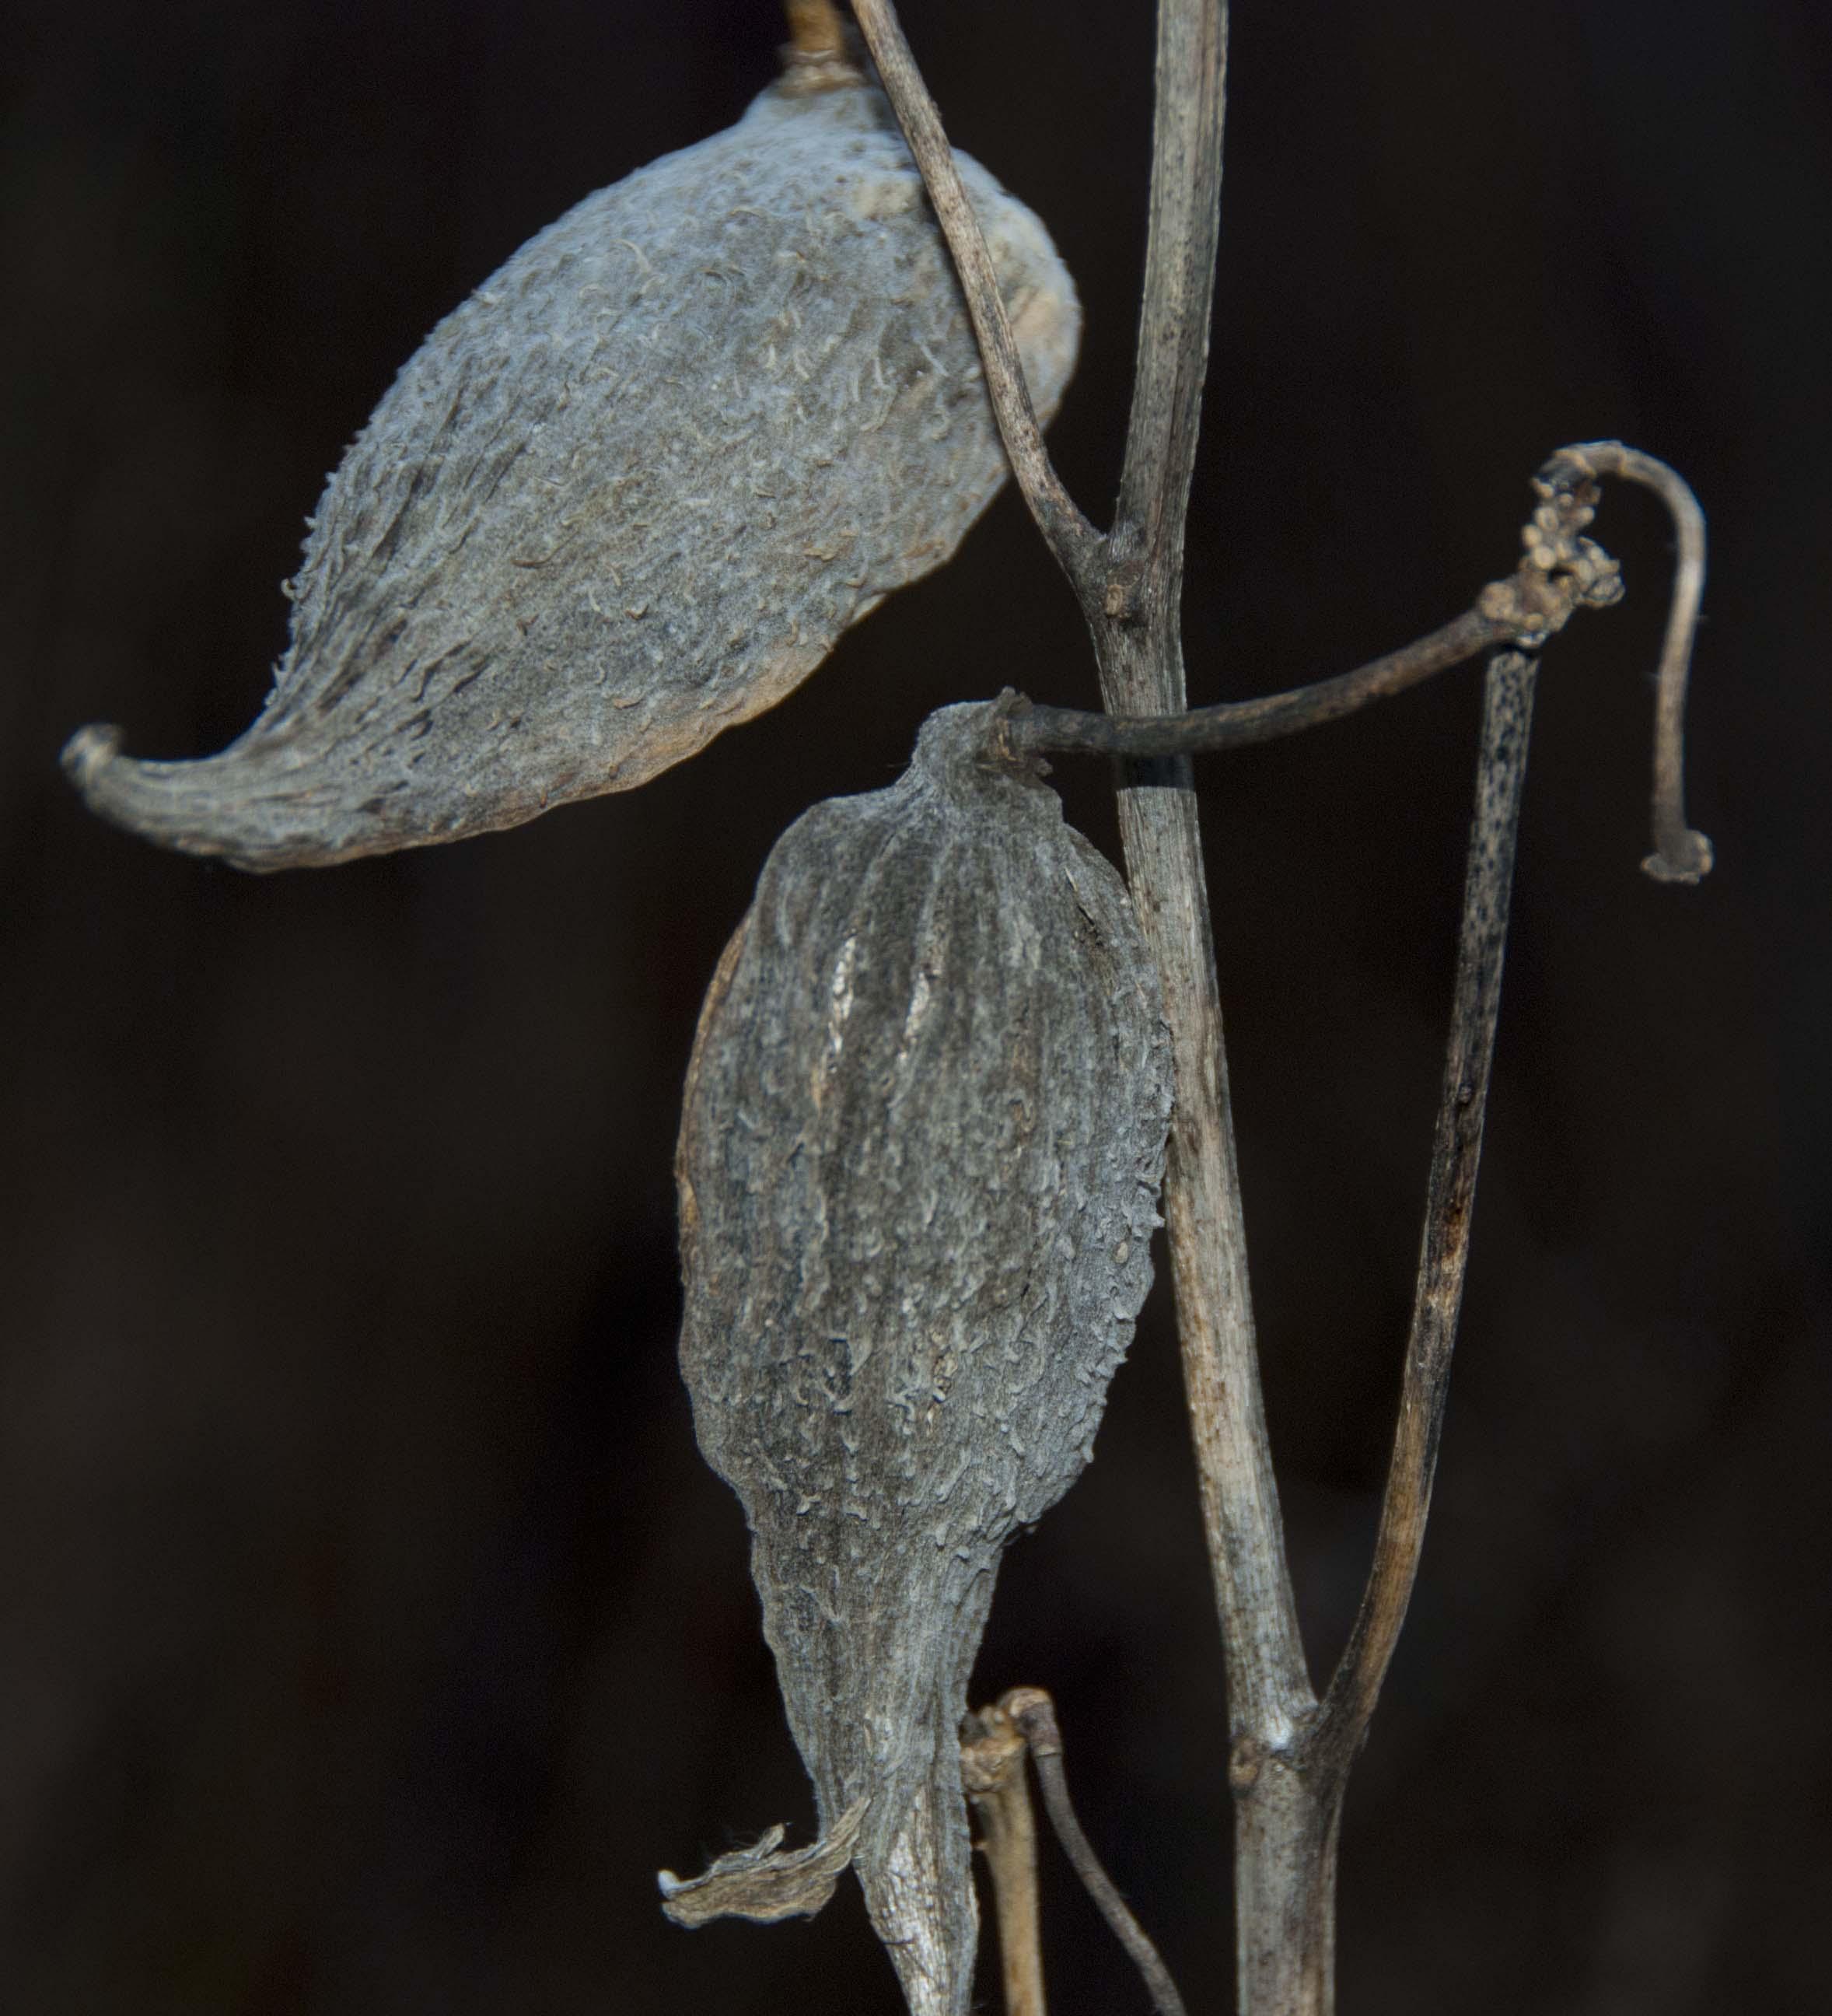 Milkweed Pods Wind Against Current